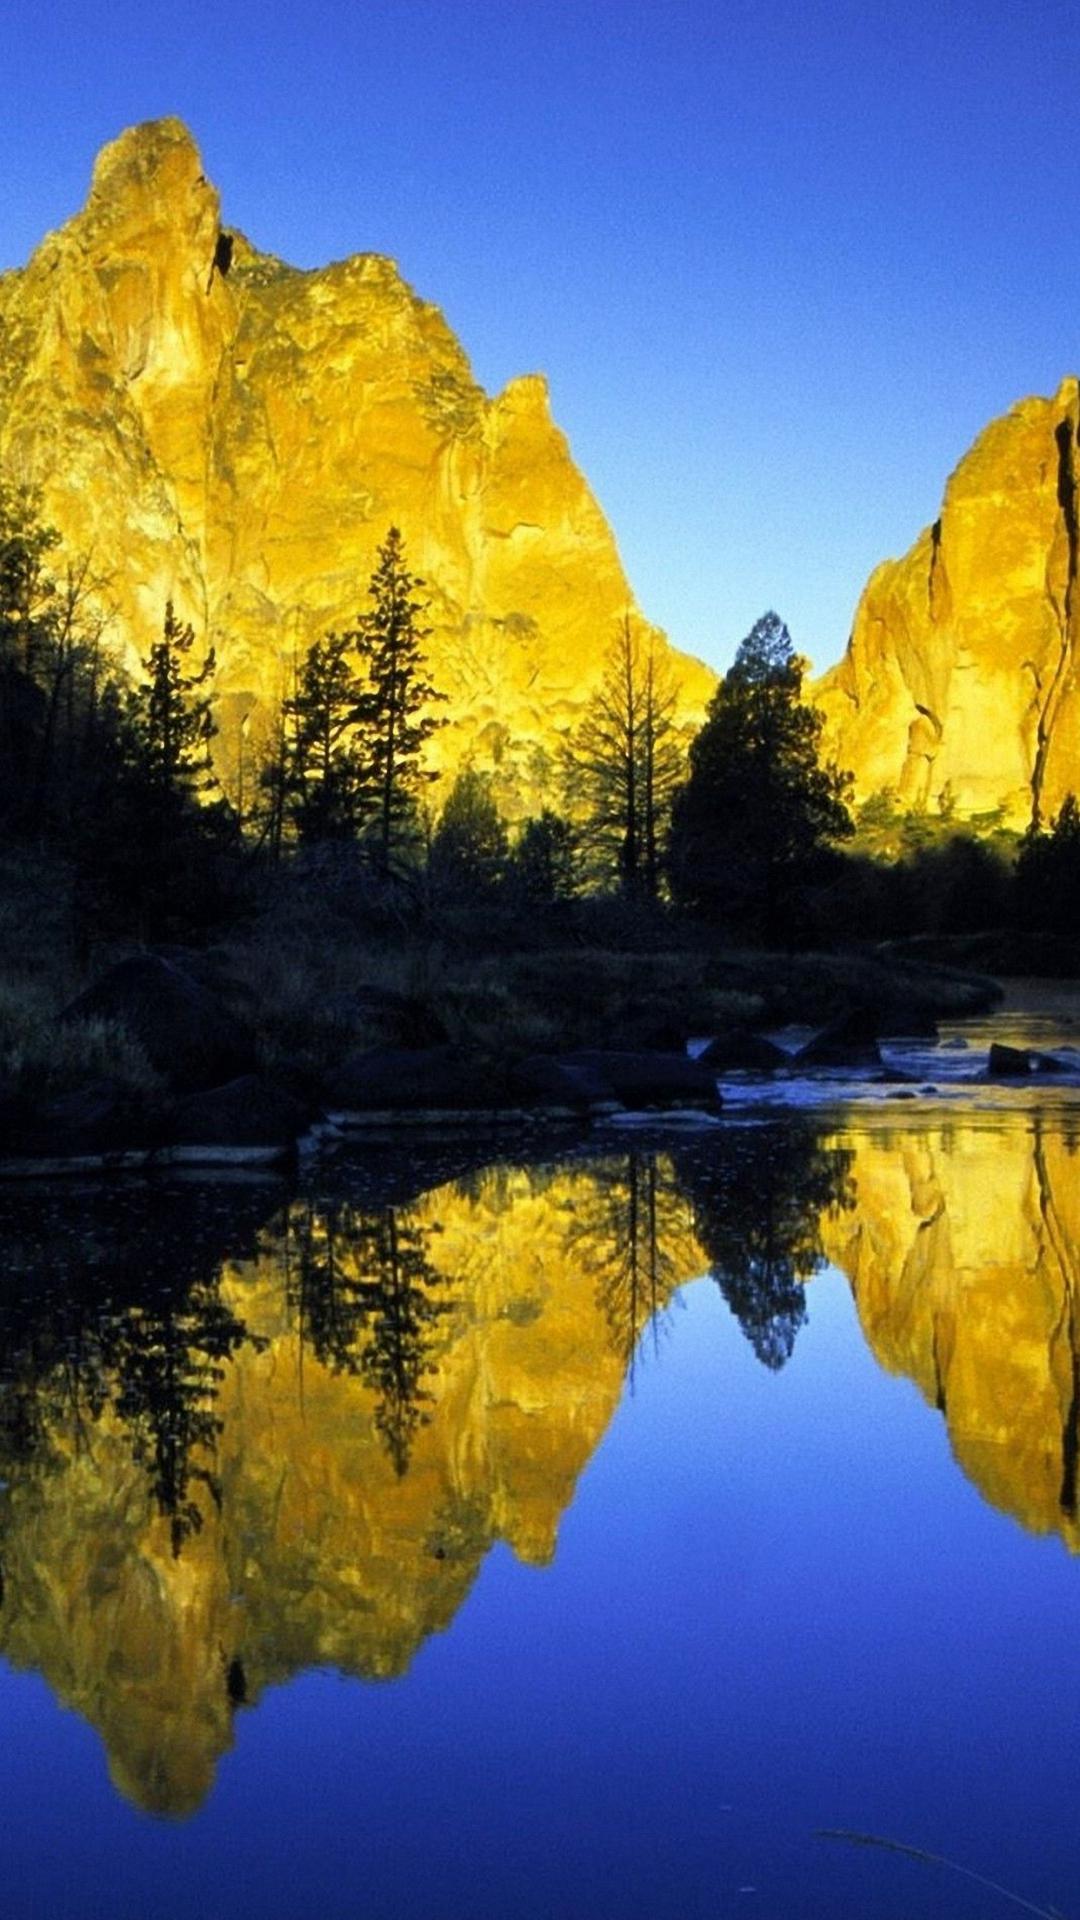 1080x1920 Mountains River Reflectian iphone 6s plus Wallpaper HD 1080x1920